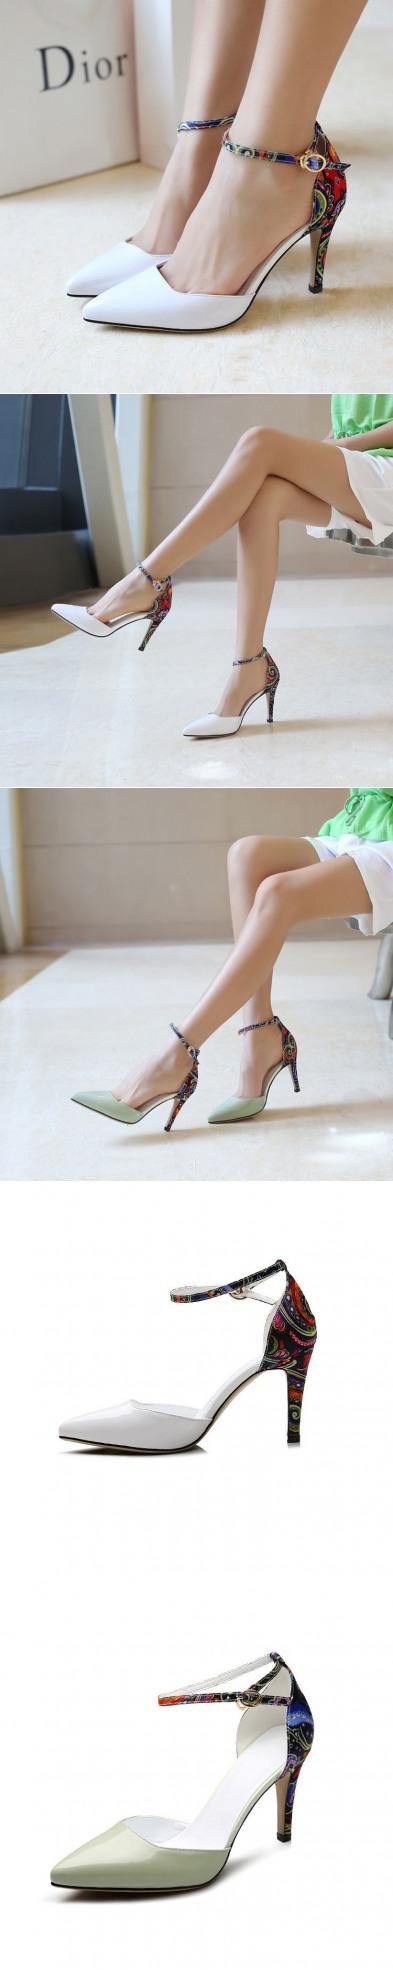 Economical High Heel Online Free Delivery Slip Resistant High